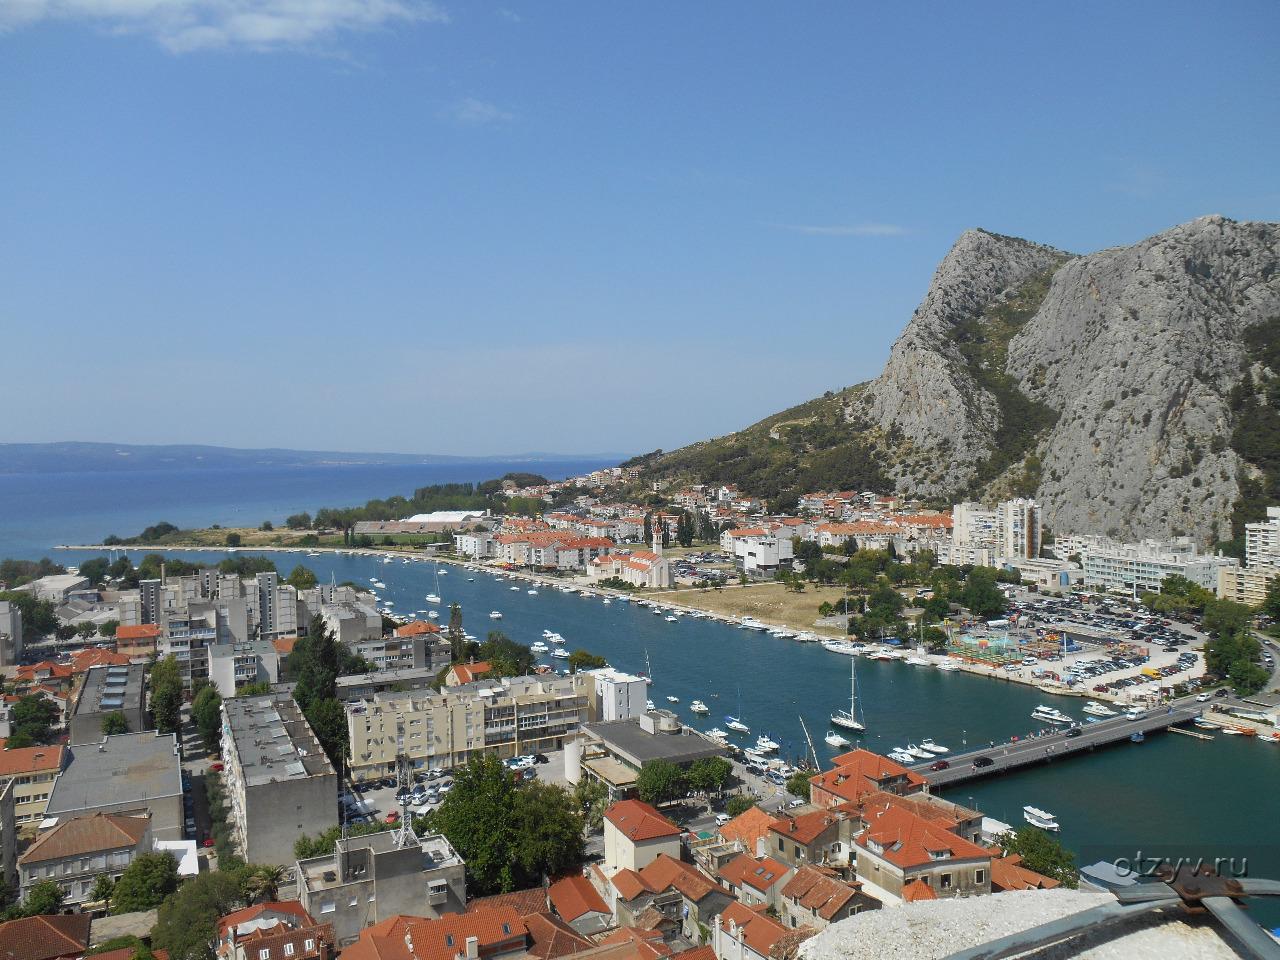 Хорватия омиш фото